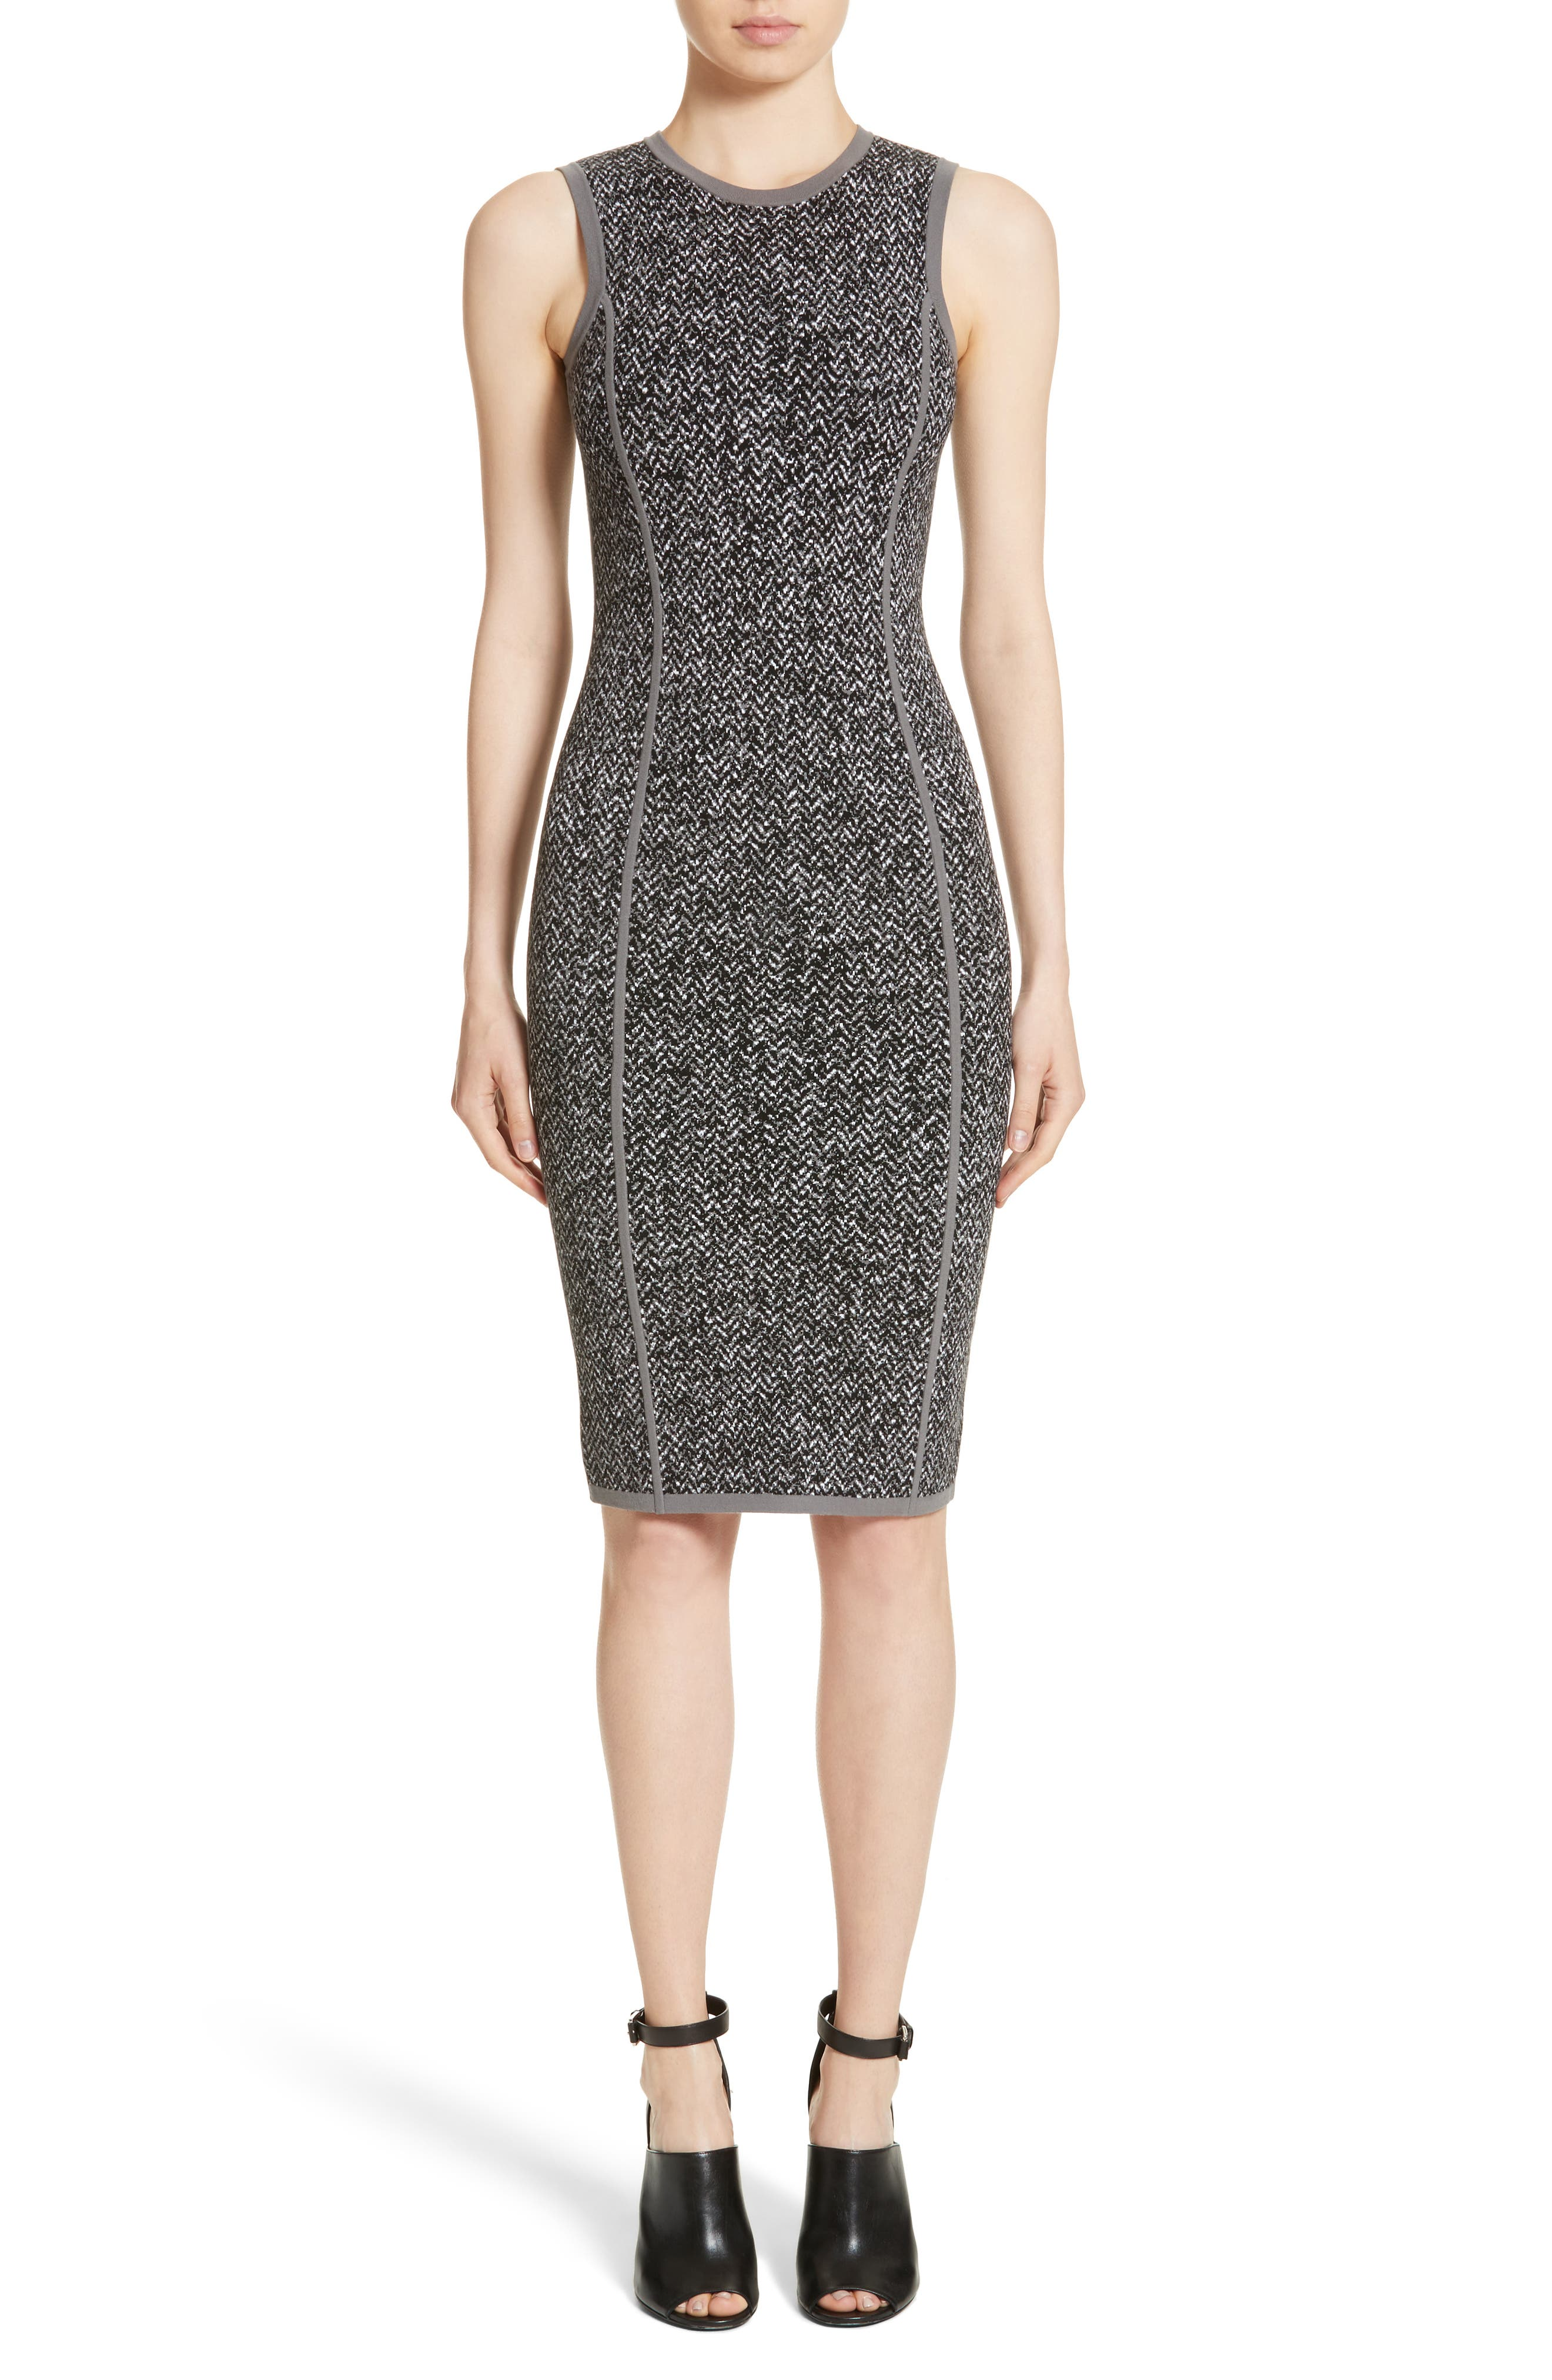 Main Image - Michael Kors Stretch Tweed Jacquard Sheath Dress